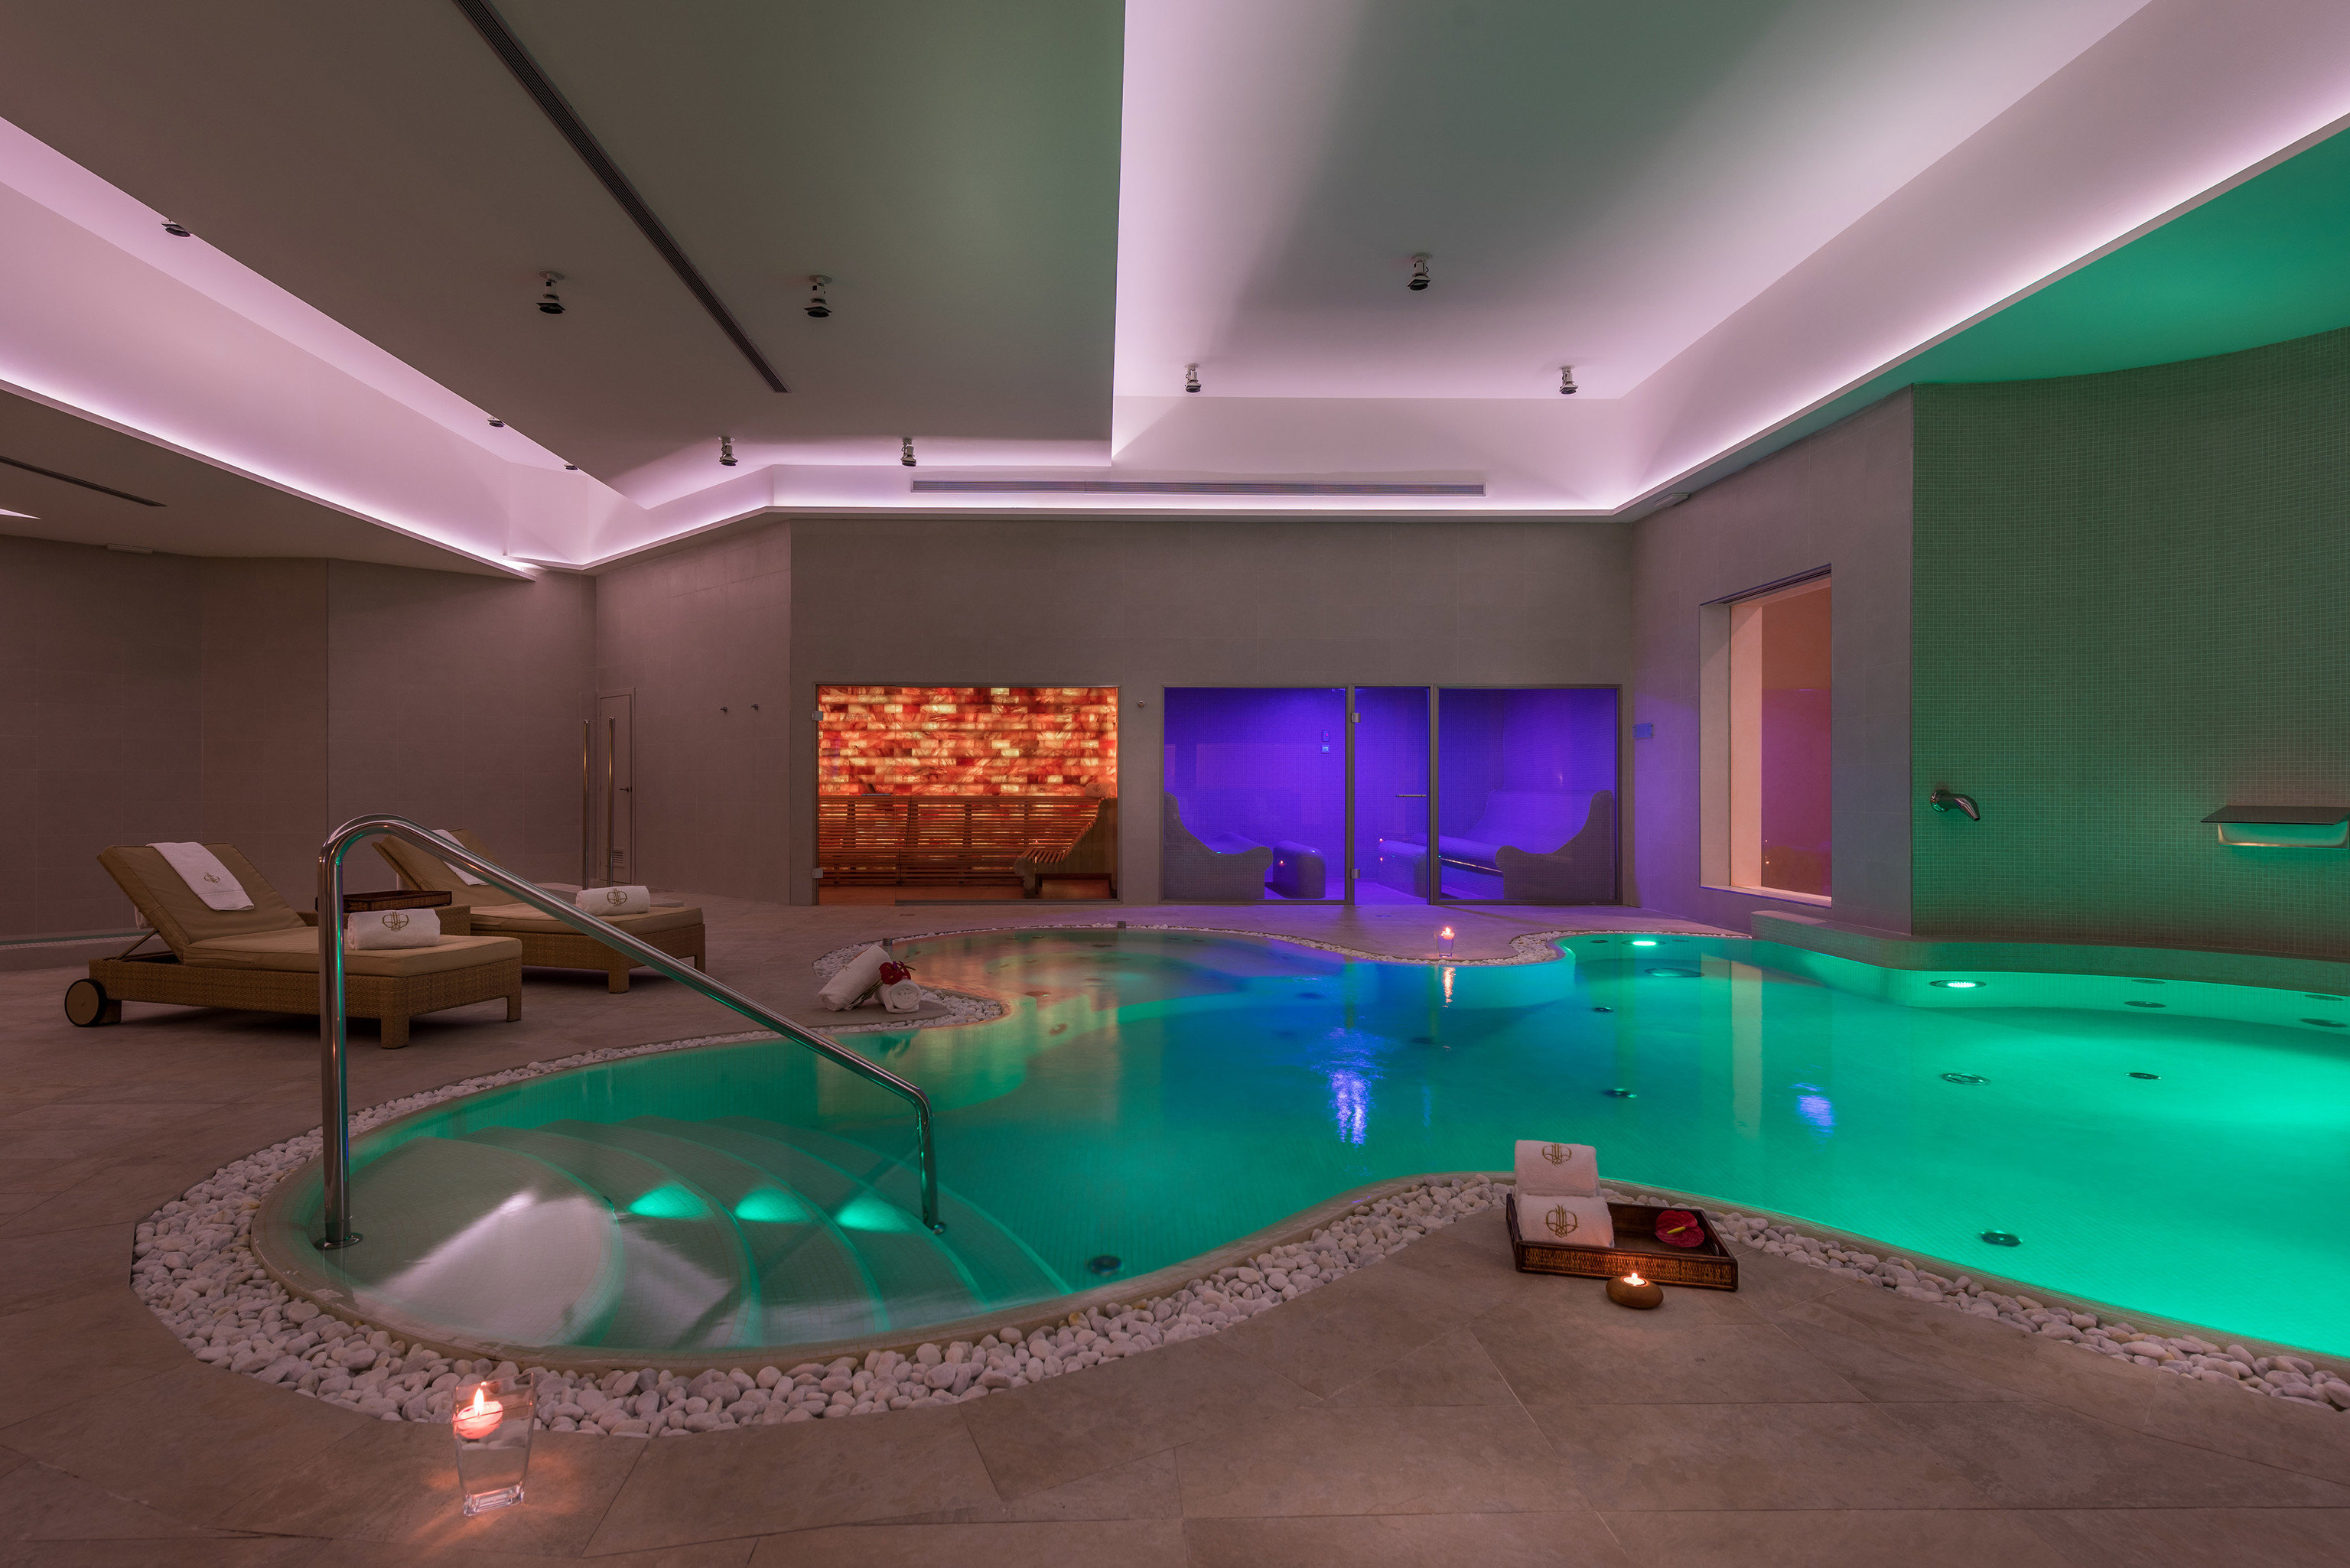 swimming pool leisure green billiard room recreation room Resort